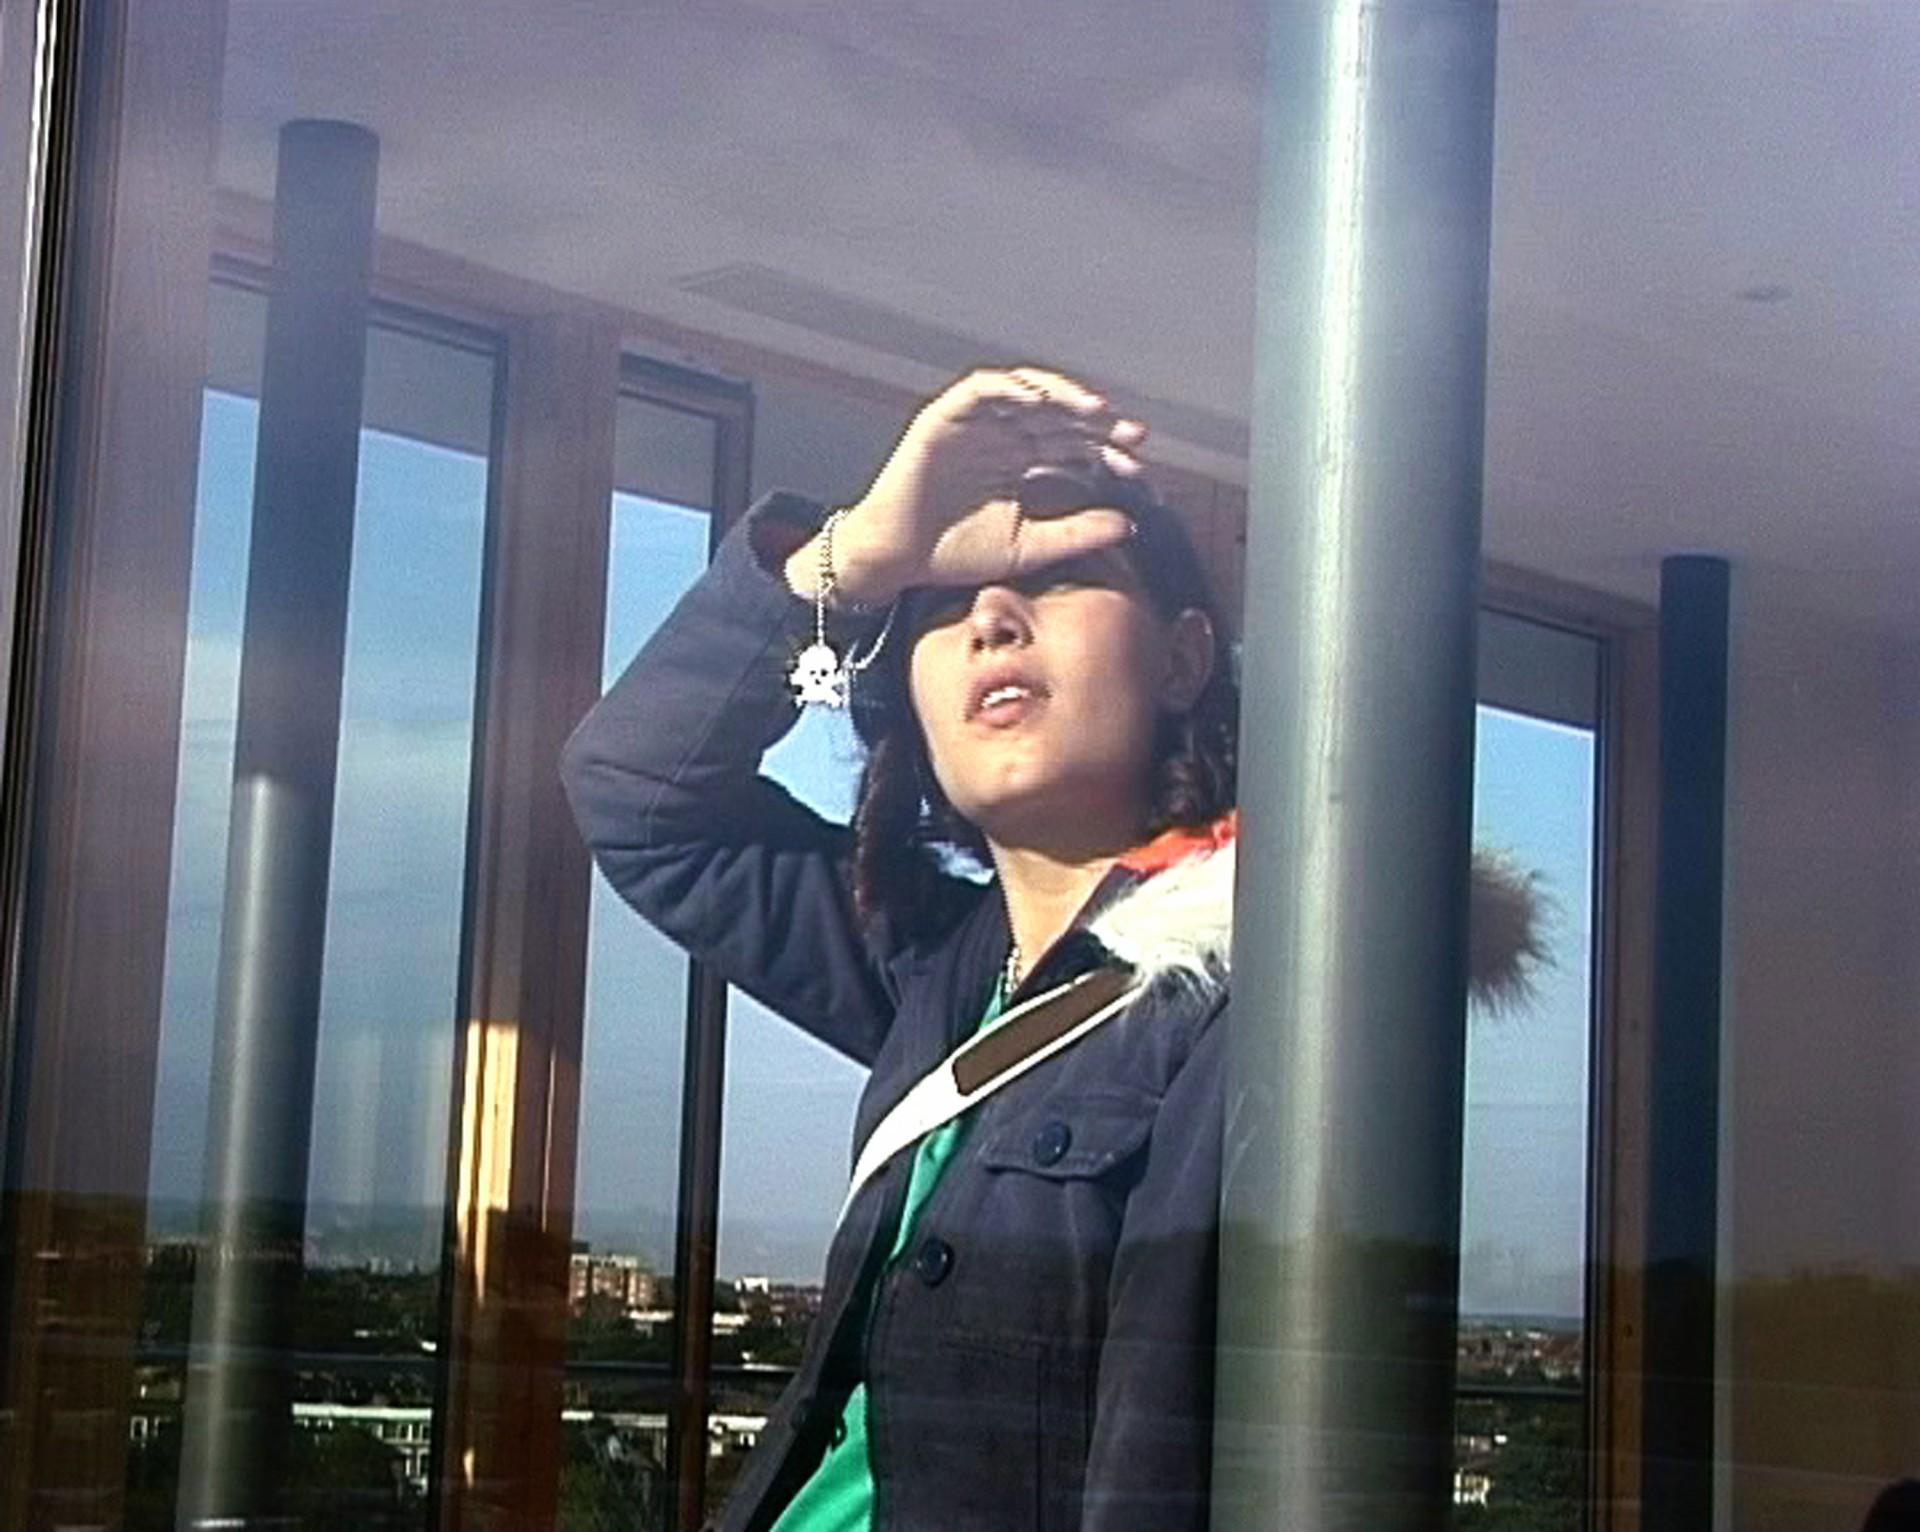 "Johanna Billing Look Out!, 2003, DV 5'20"" loop"